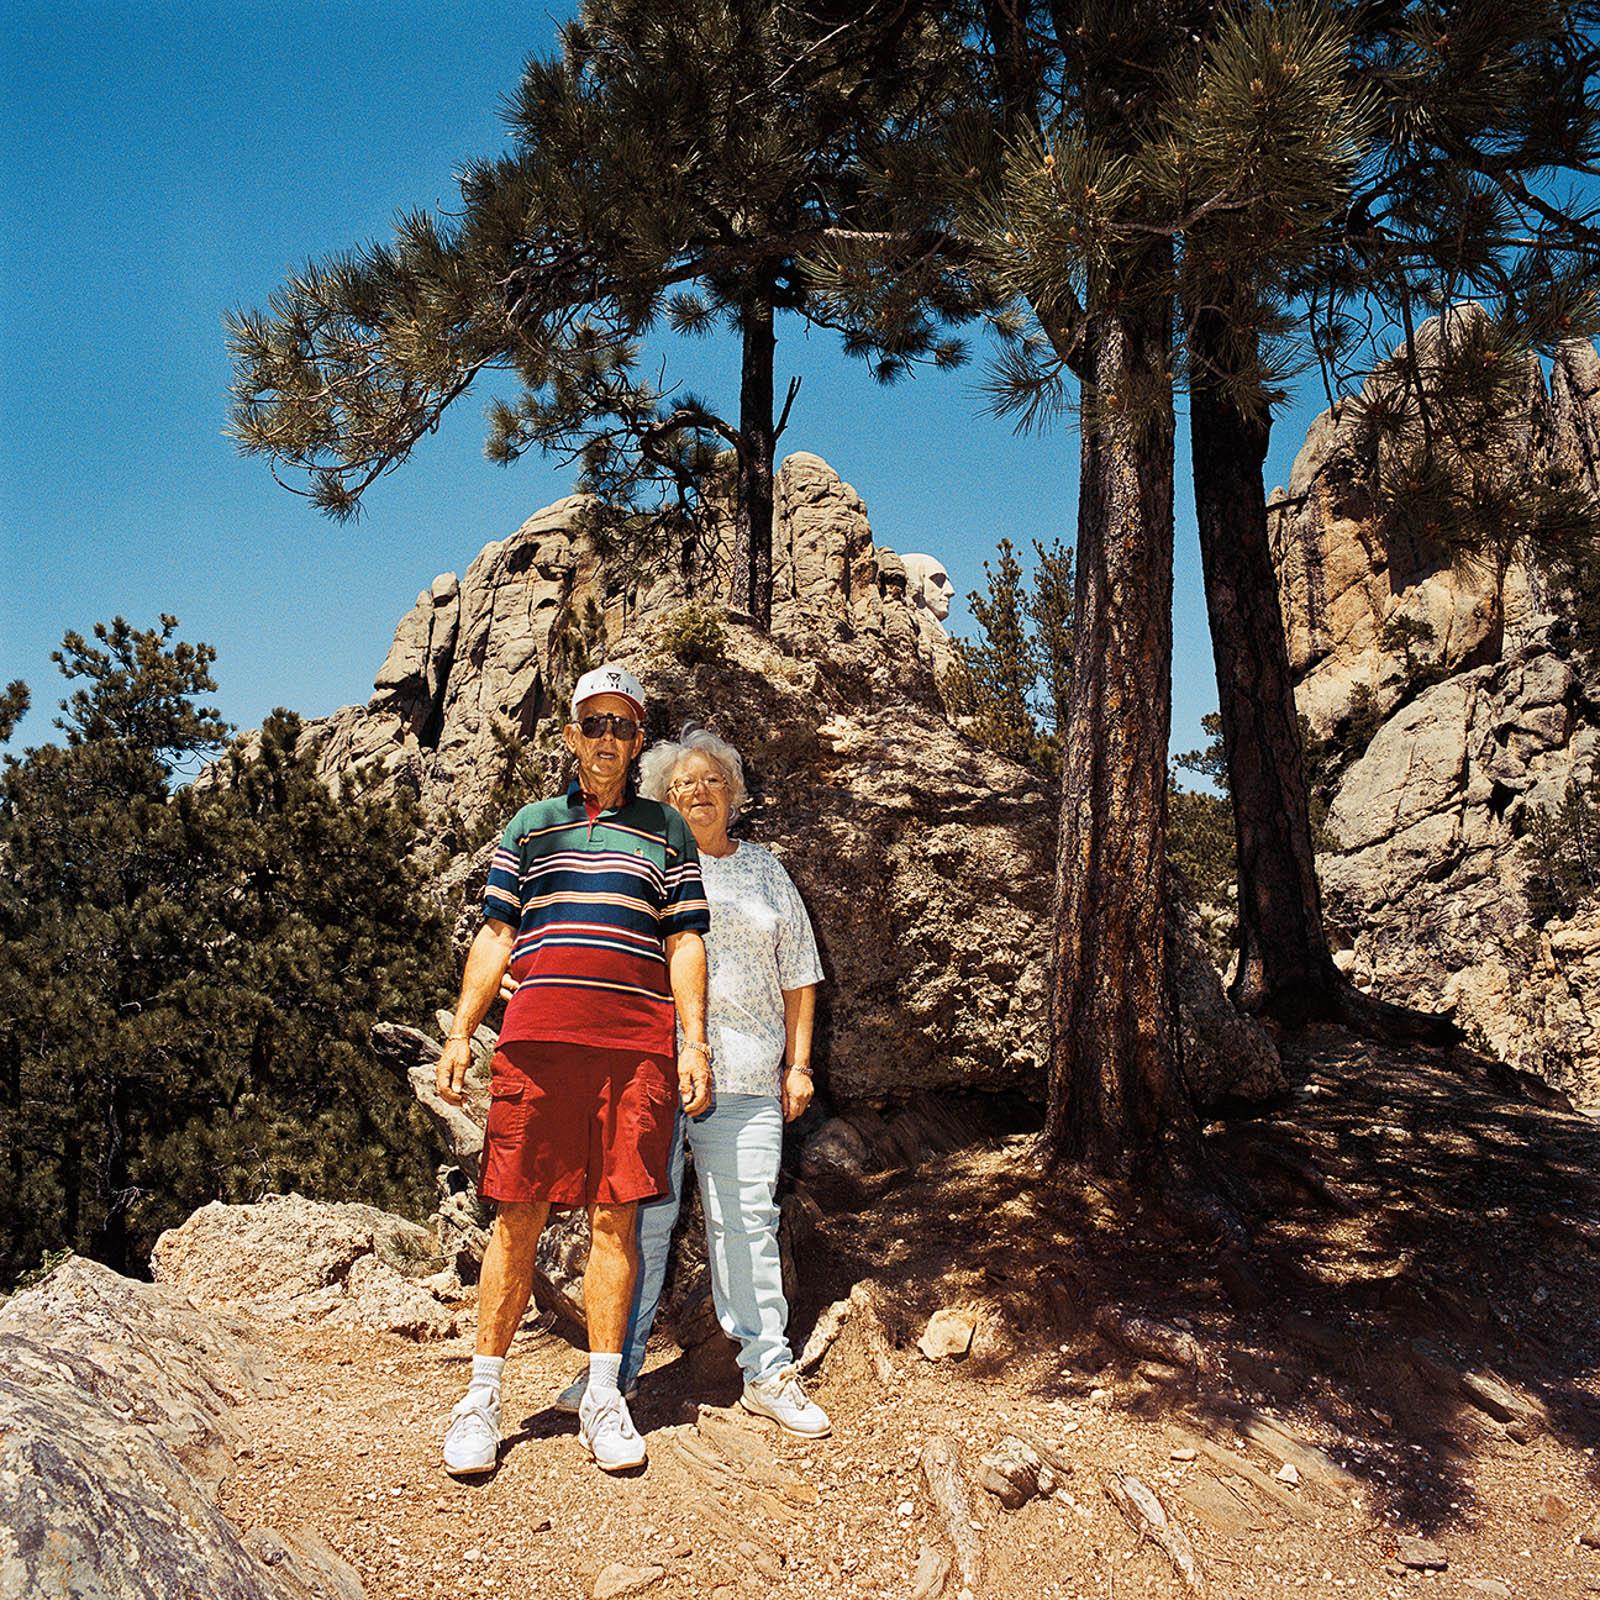 Couple at Mt Rushmore, South Dakota 1998